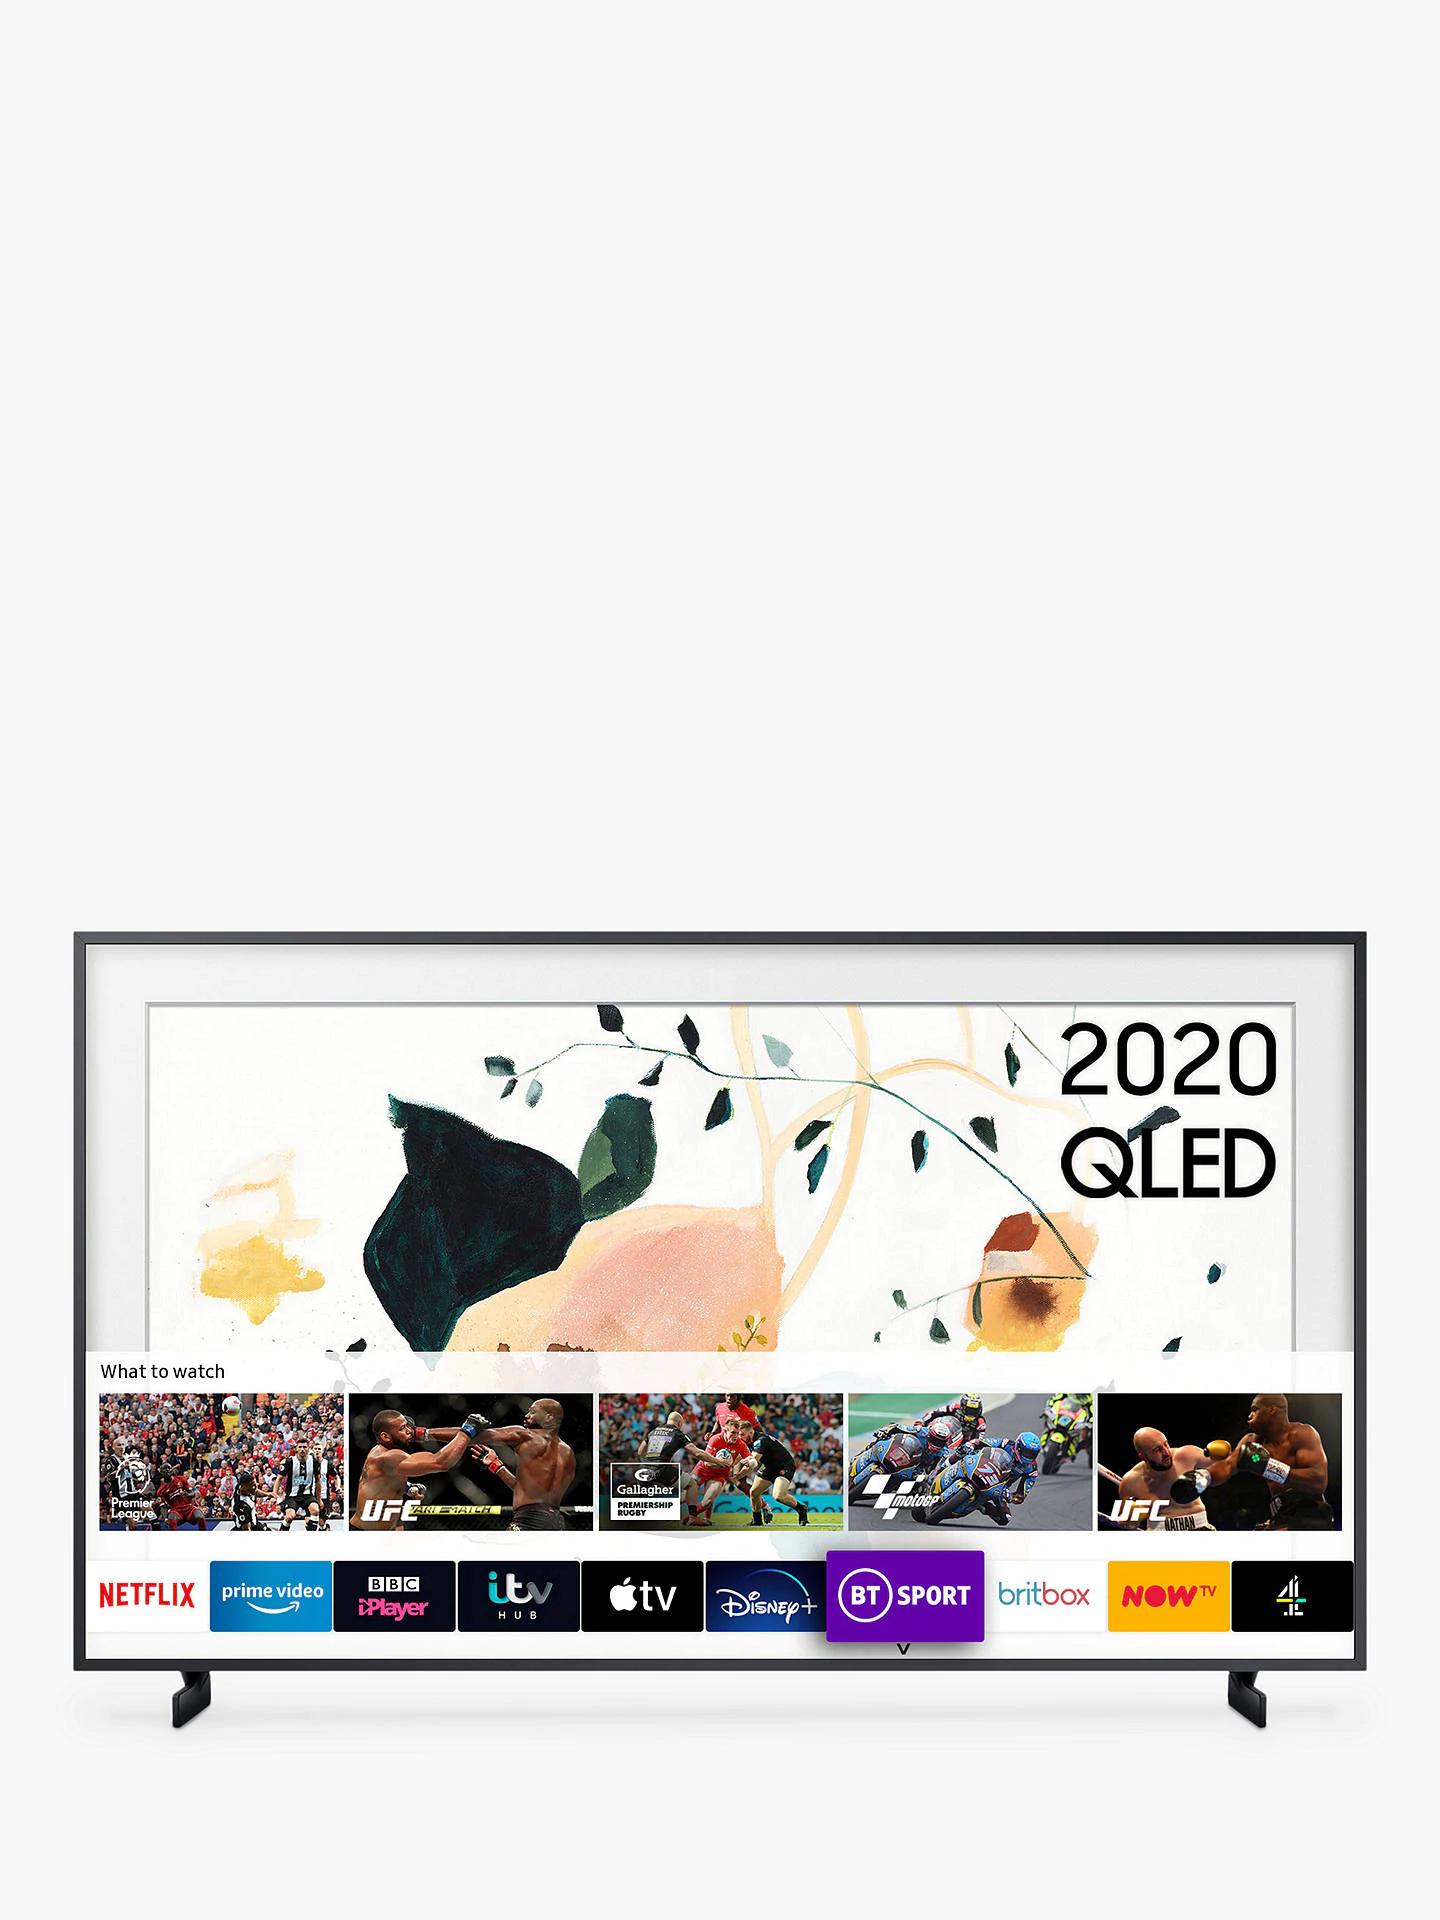 "Samsung The Frame (2020) Full HD QLED TV 32"" £599 @ John Lewis & partners with £250 cashback"